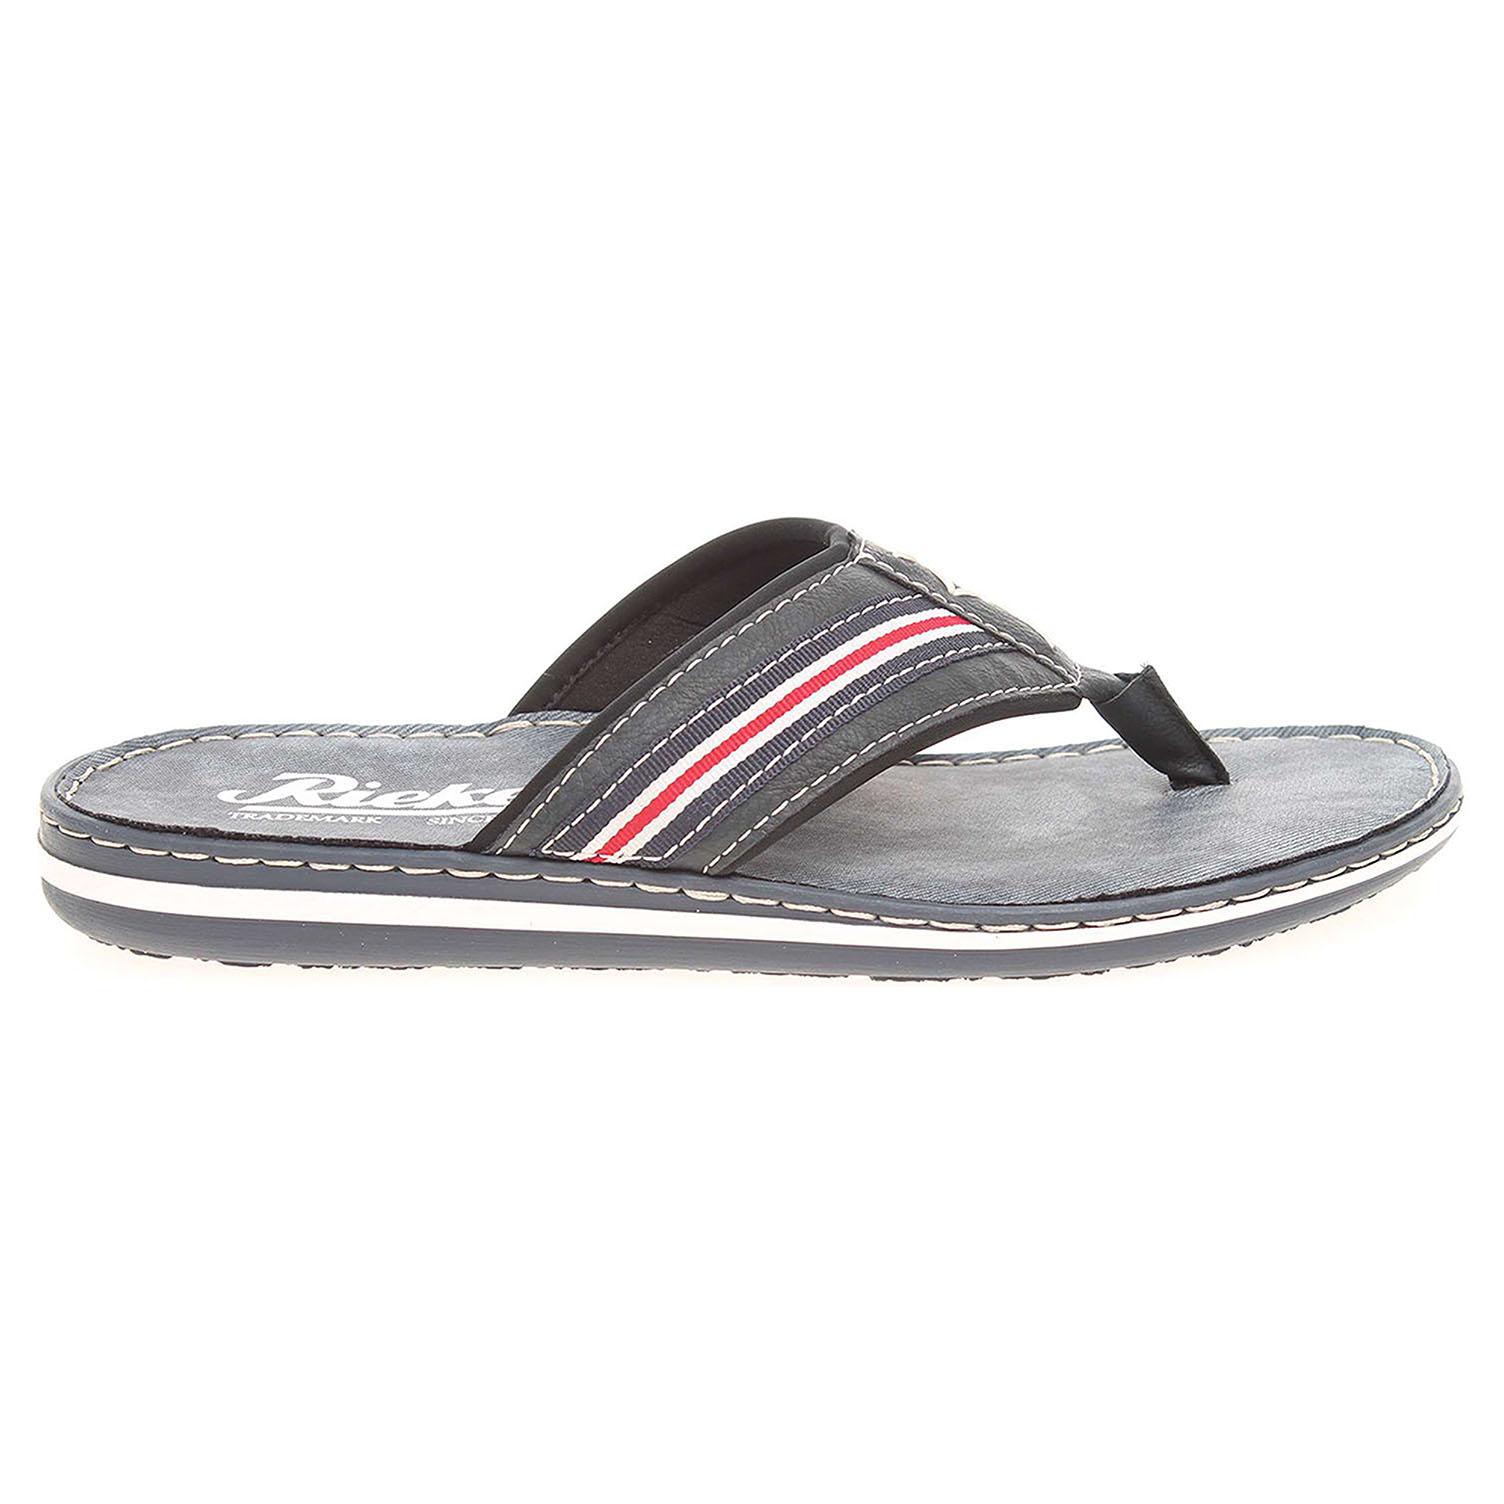 Ecco Rieker pánské pantofle 21081-14 modré 24900142 bdddf52565